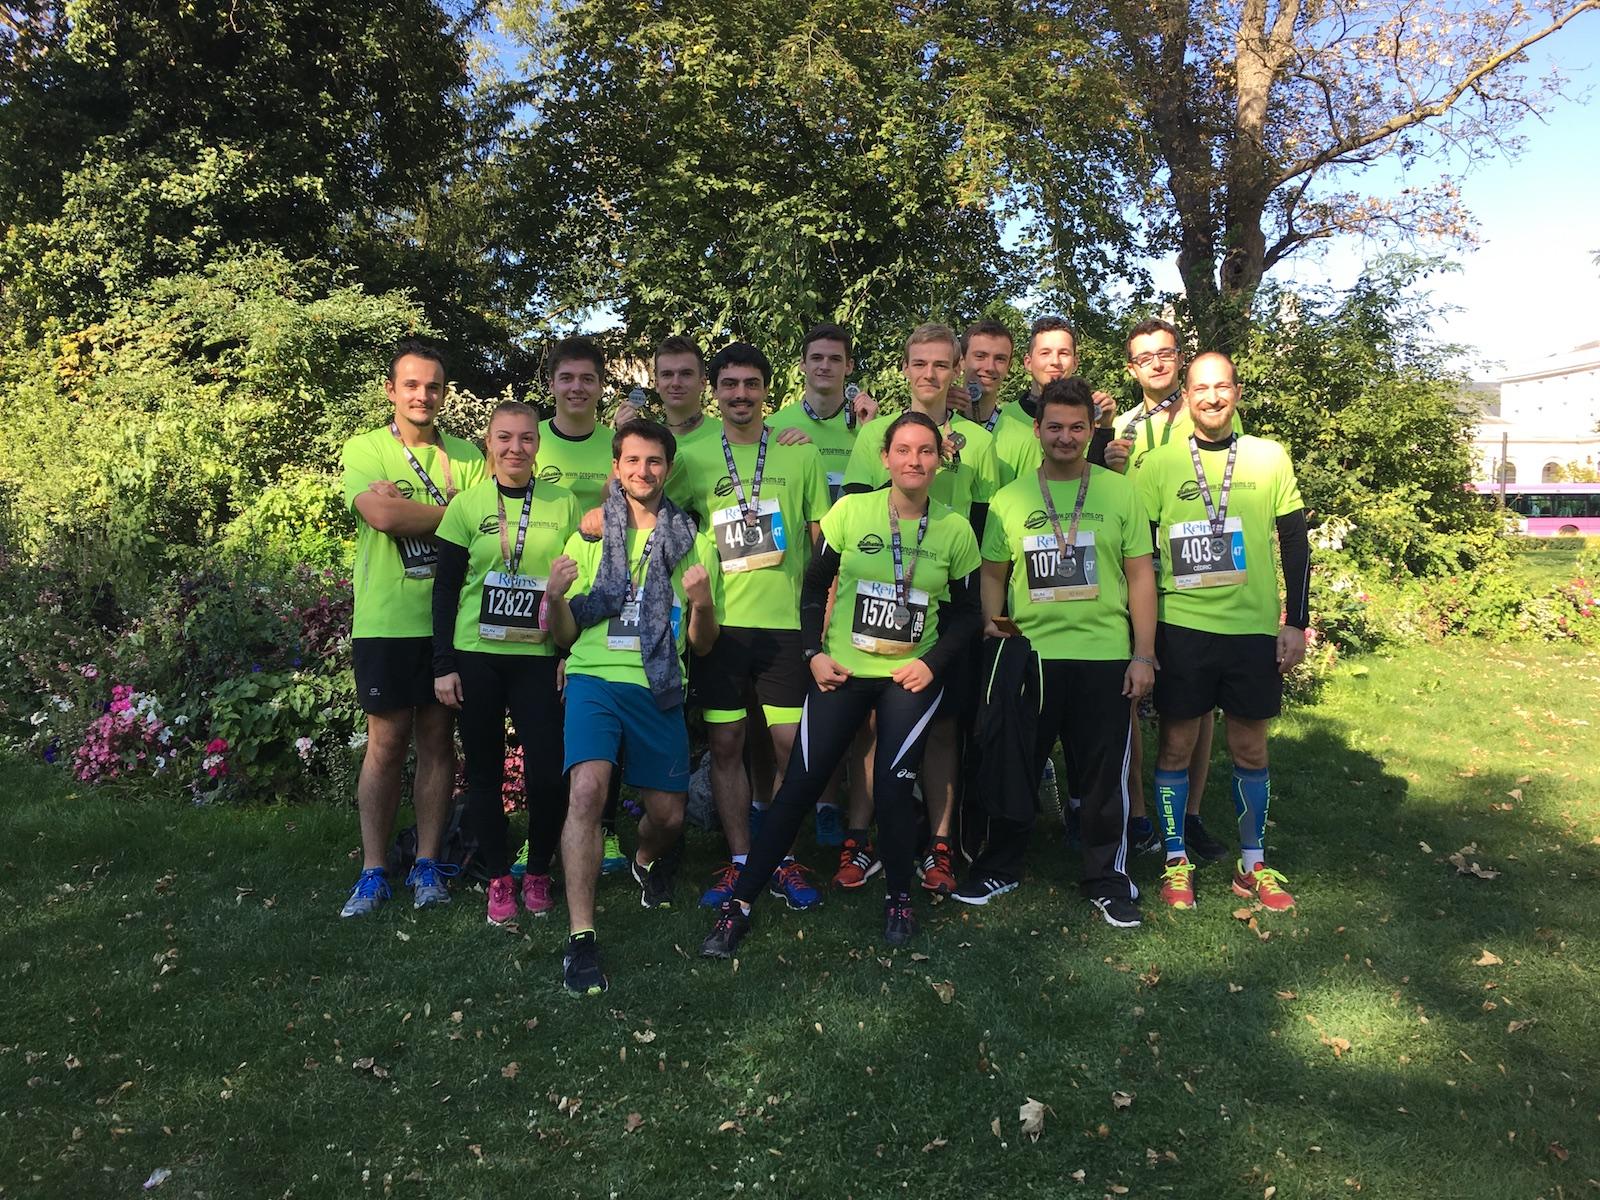 Run in Reims 2016